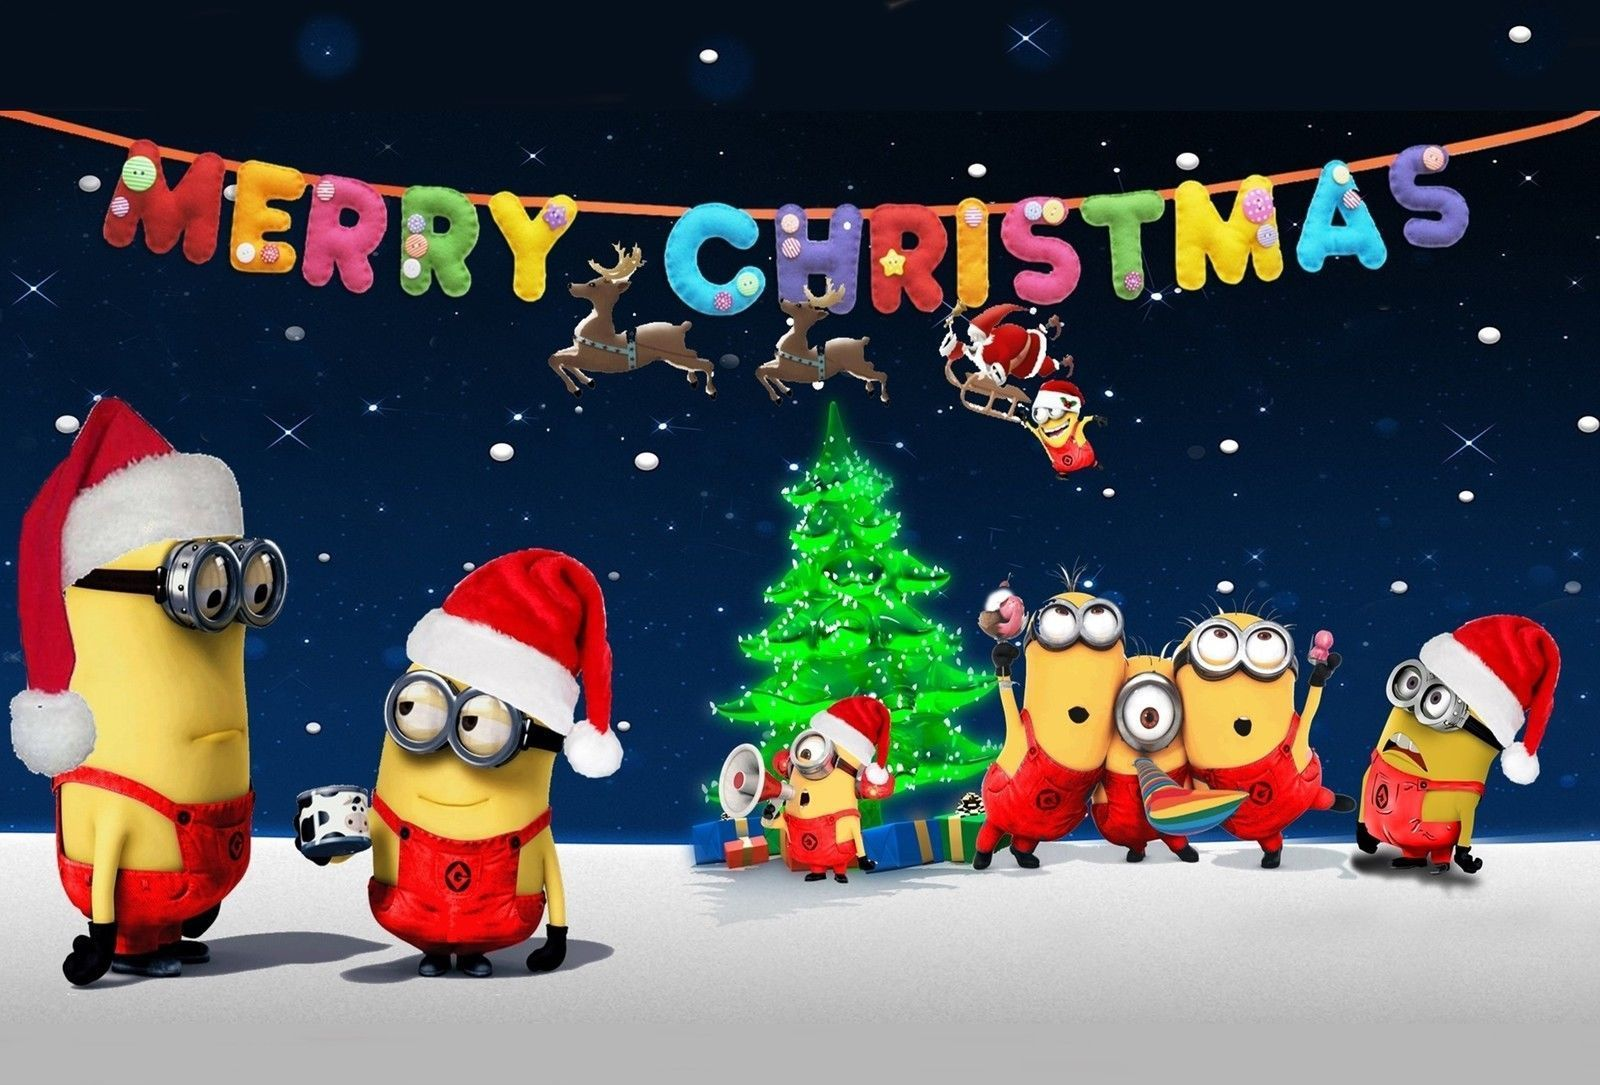 minions christmas desktop tablet wallpaper. | too cute ...